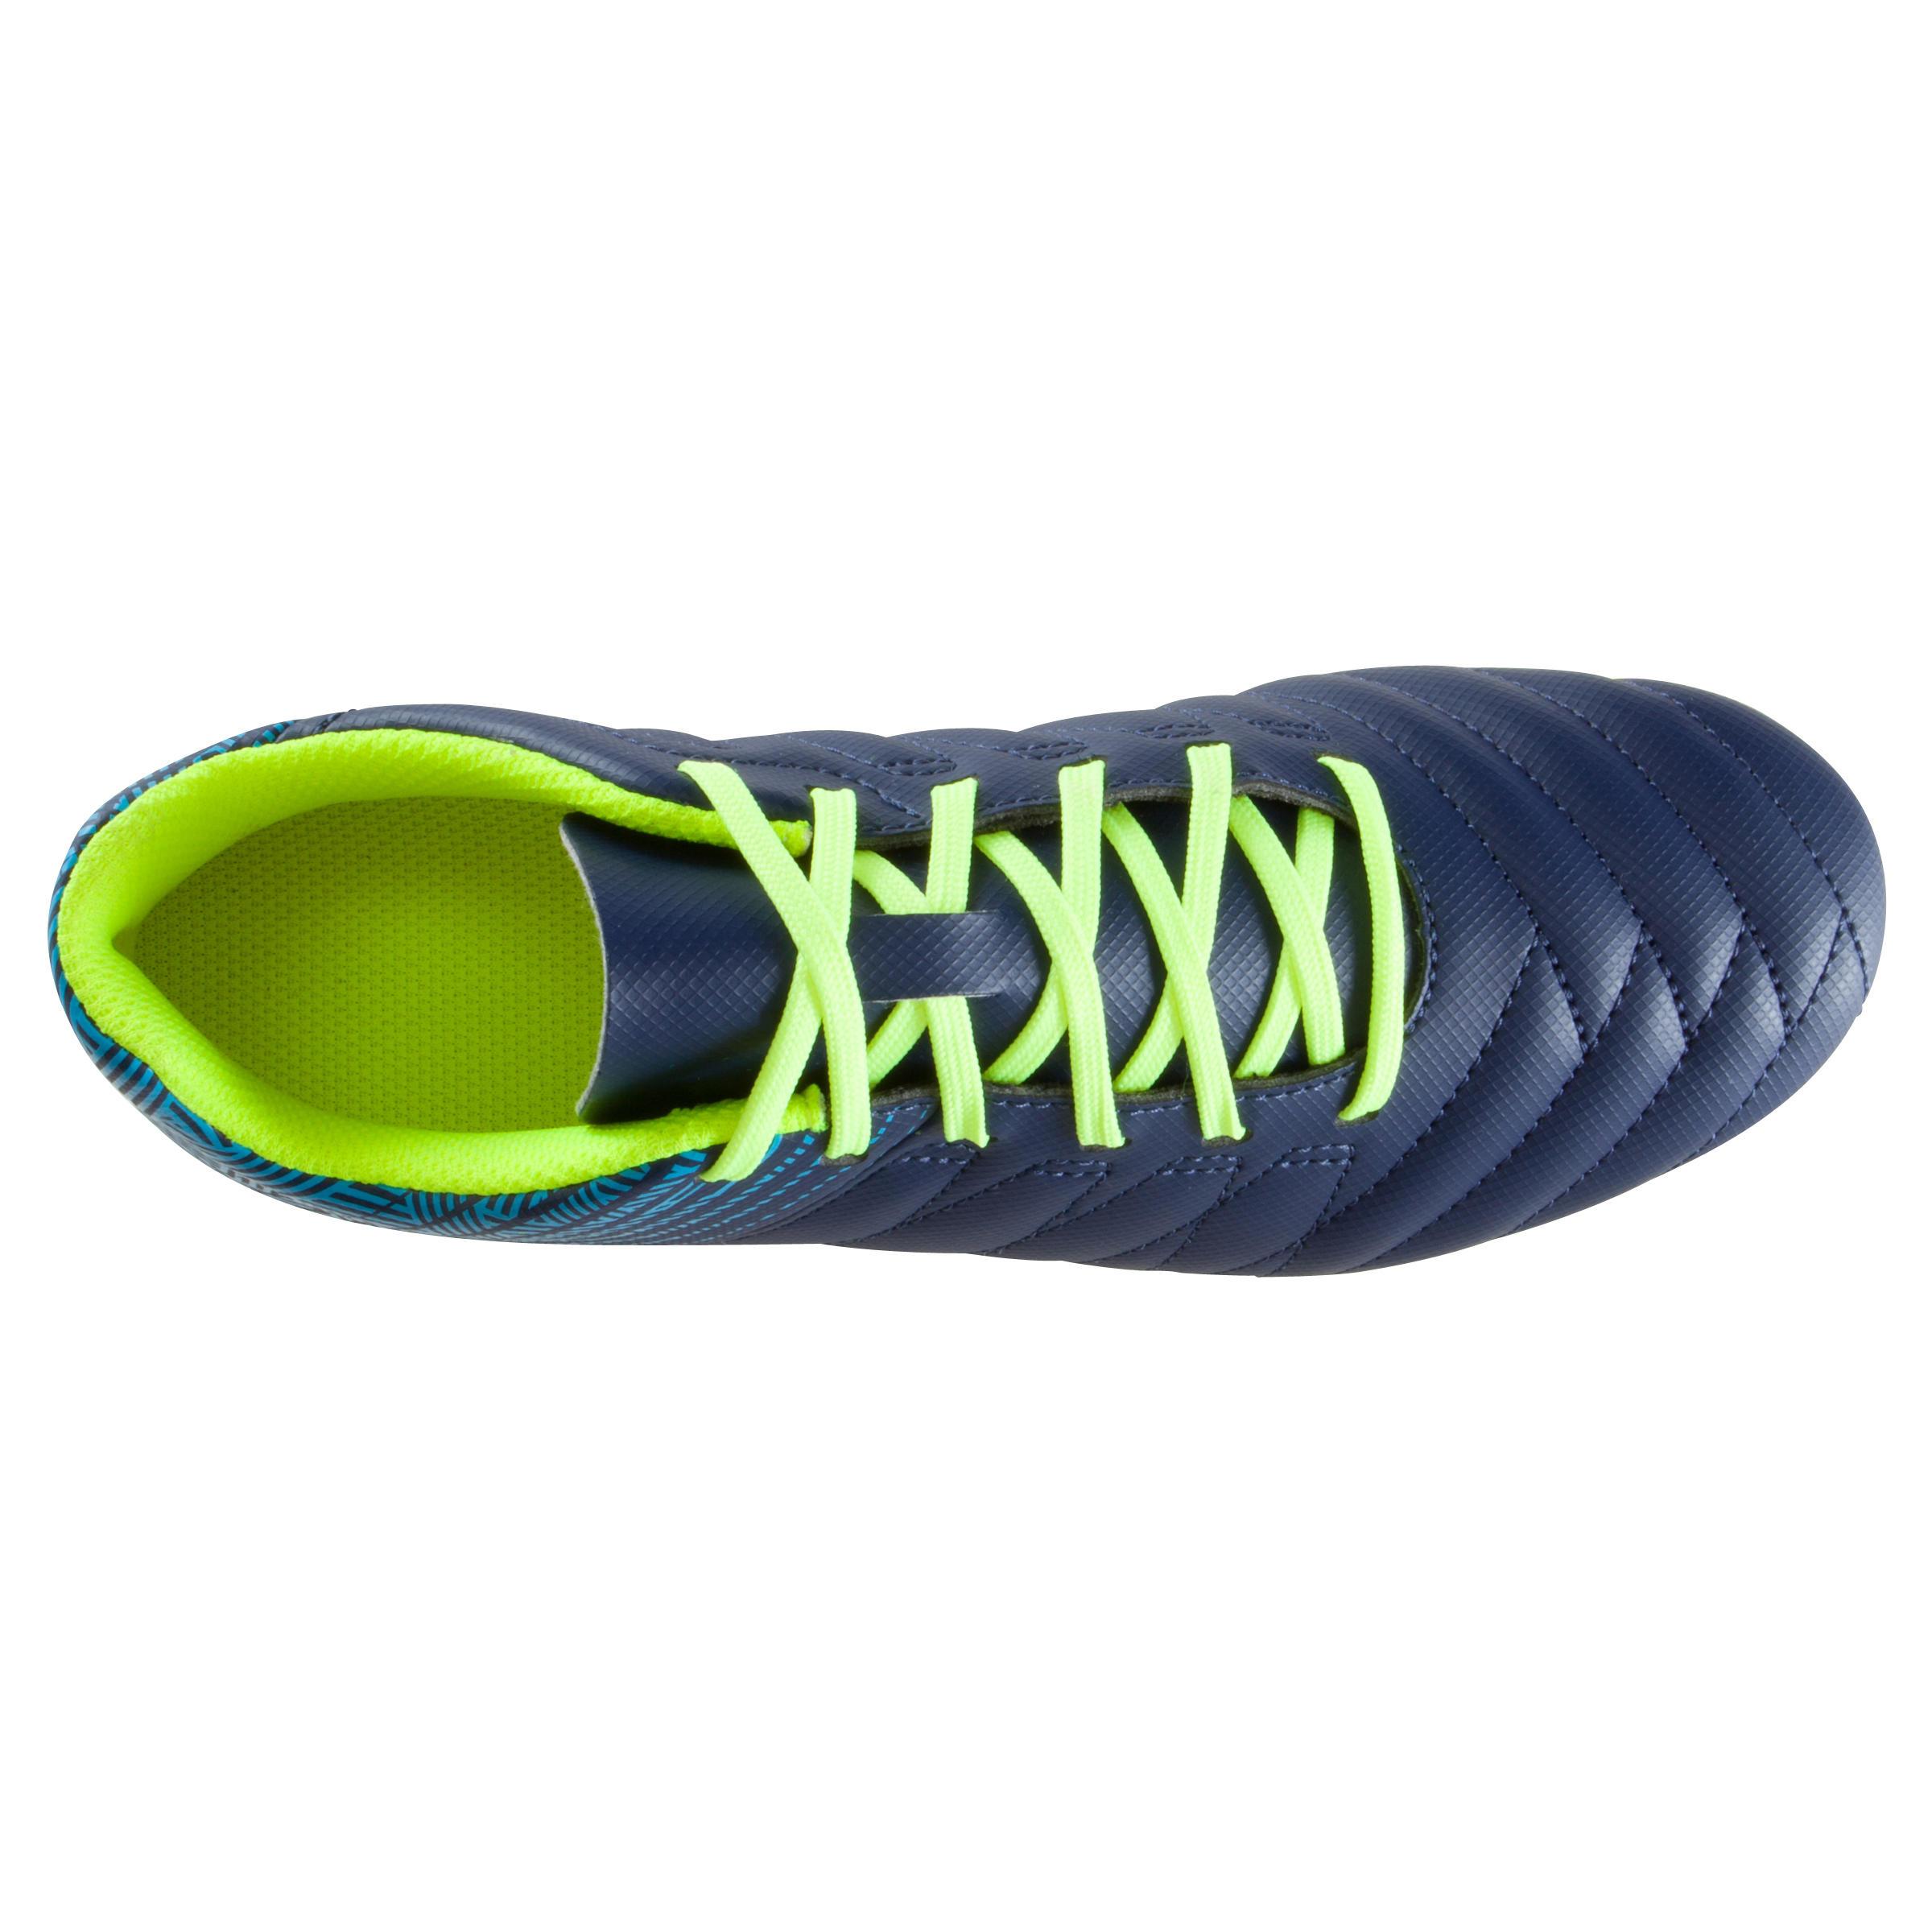 Kids' Football Boots Agility 140 FG - Blue/Neon Yellow